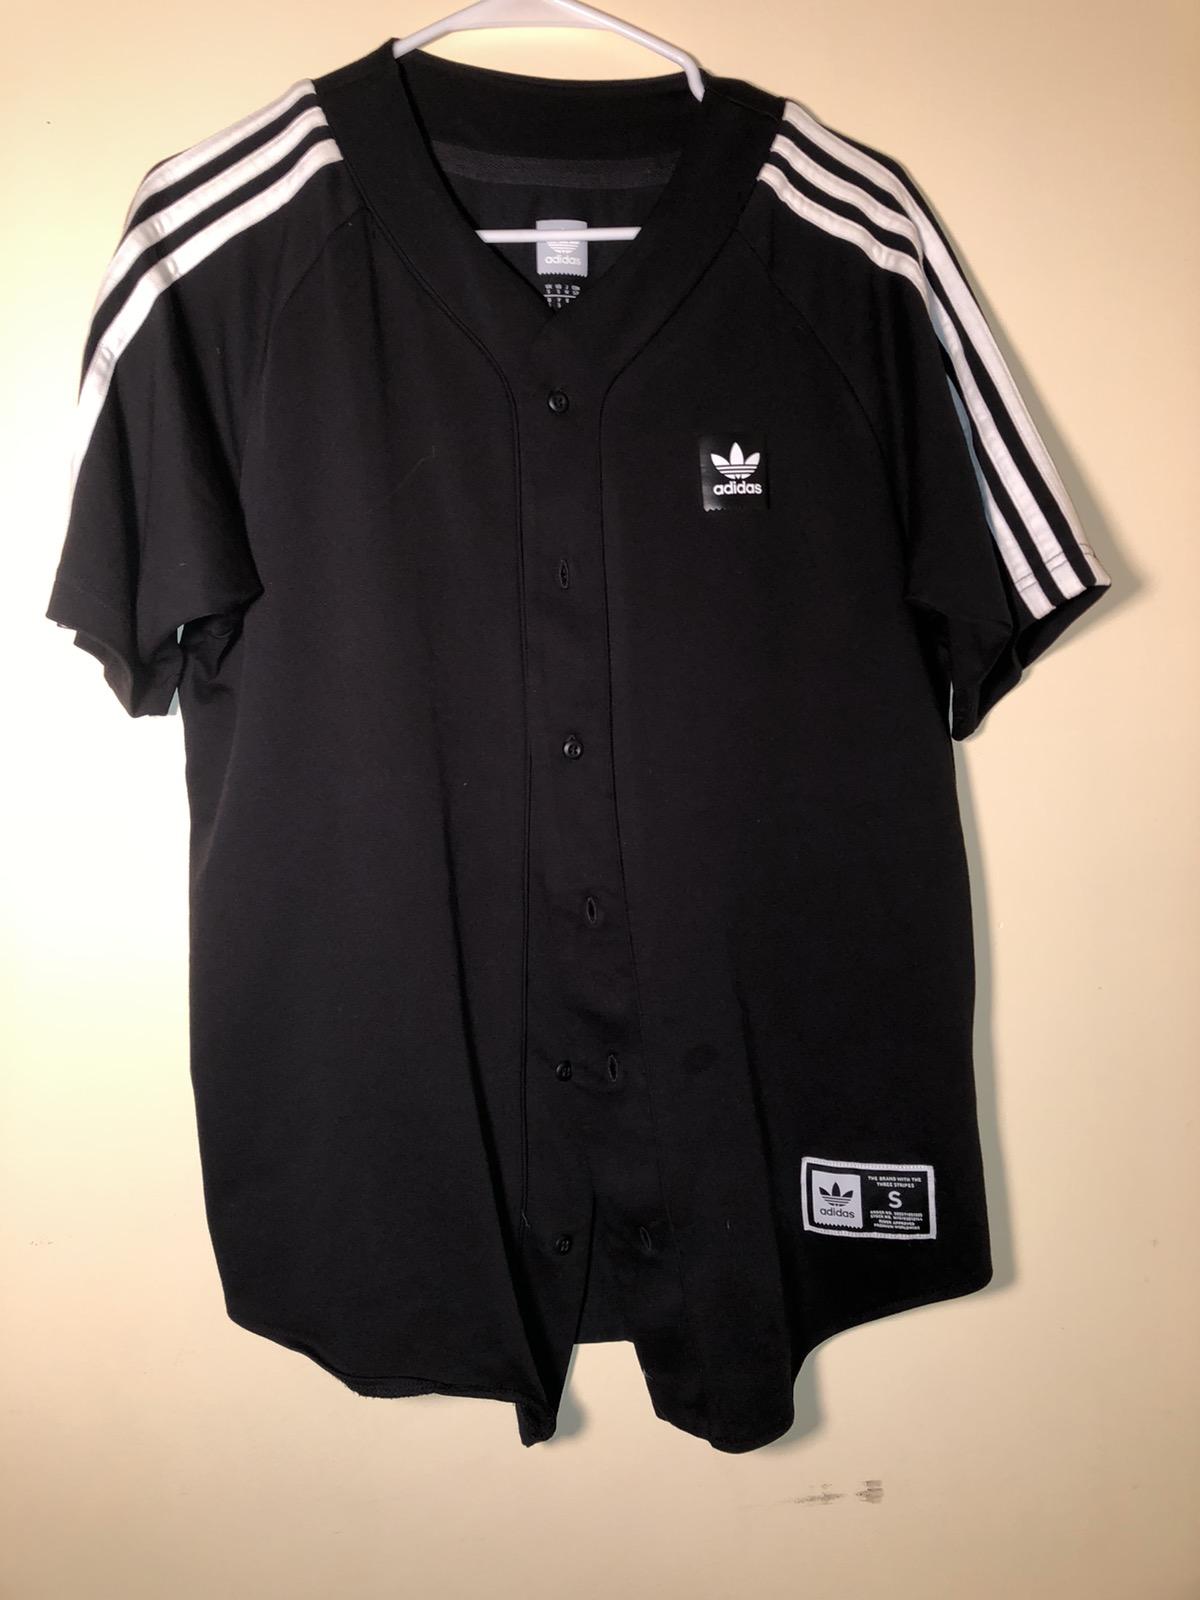 Adidas Adidas baseball jersey button up